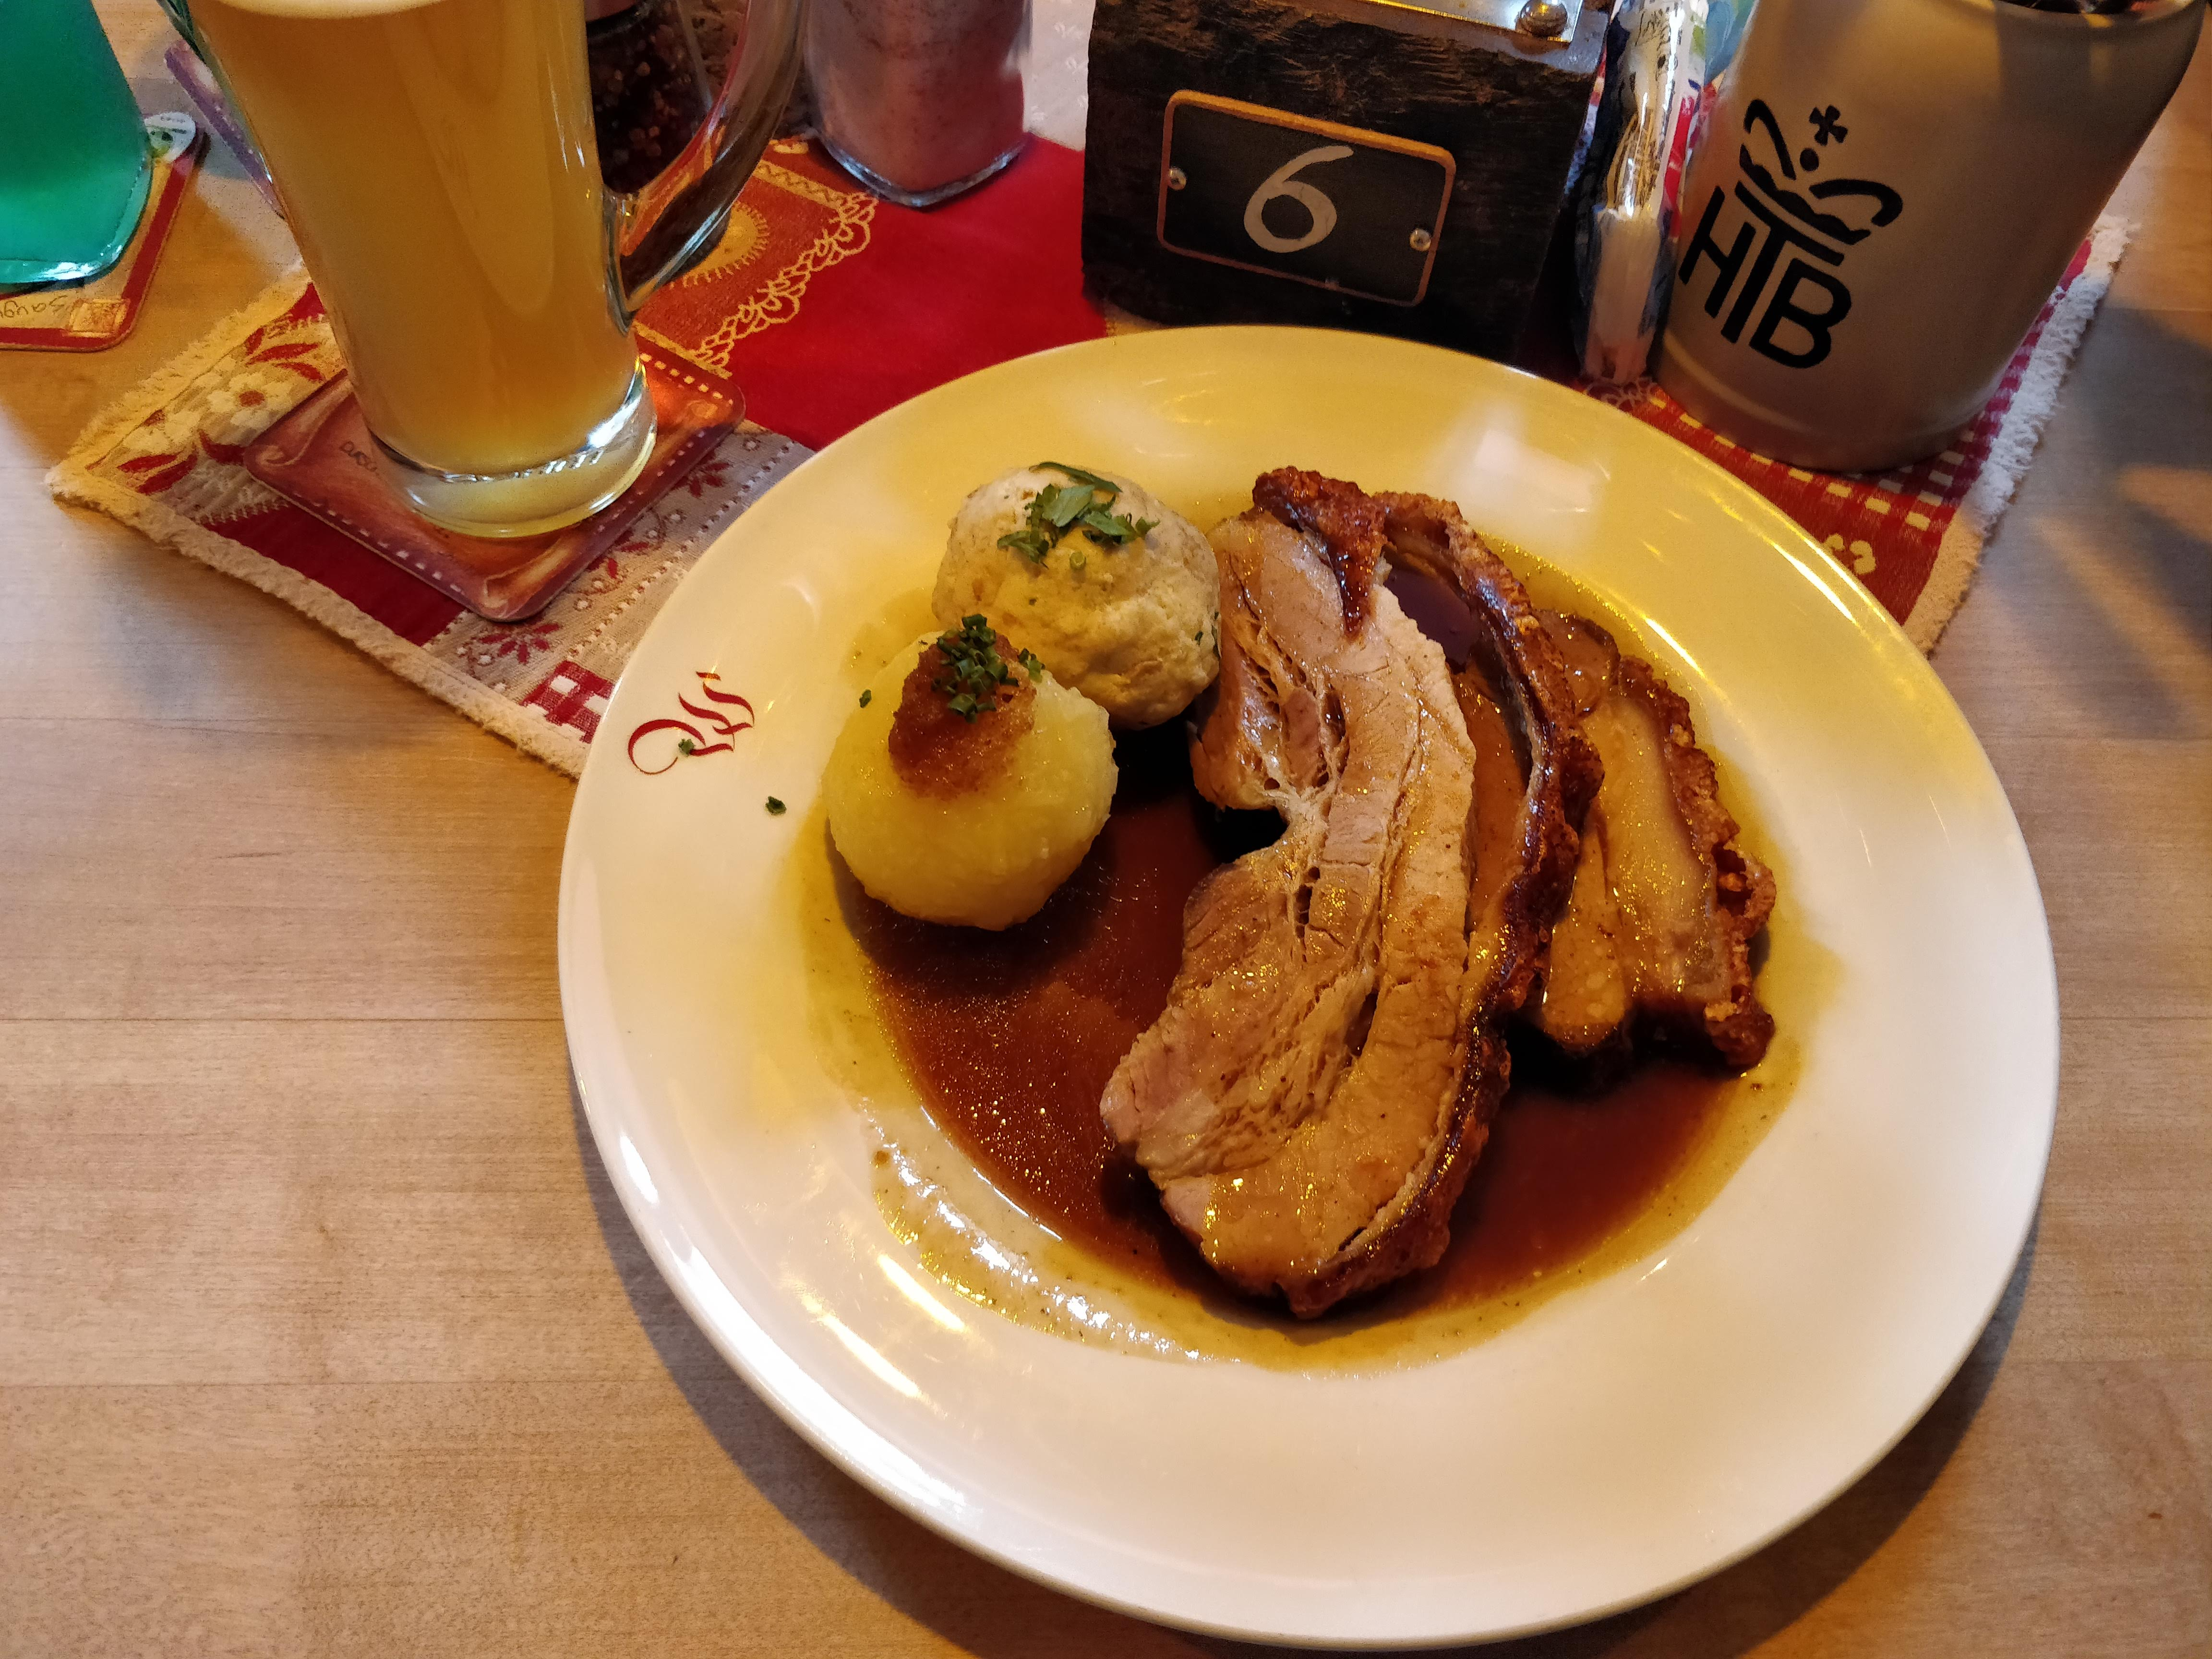 https://foodloader.net/nico_2018-11-02_krustenbraten-mit-semmelknoedel-und-kartoffelknoedel.jpg